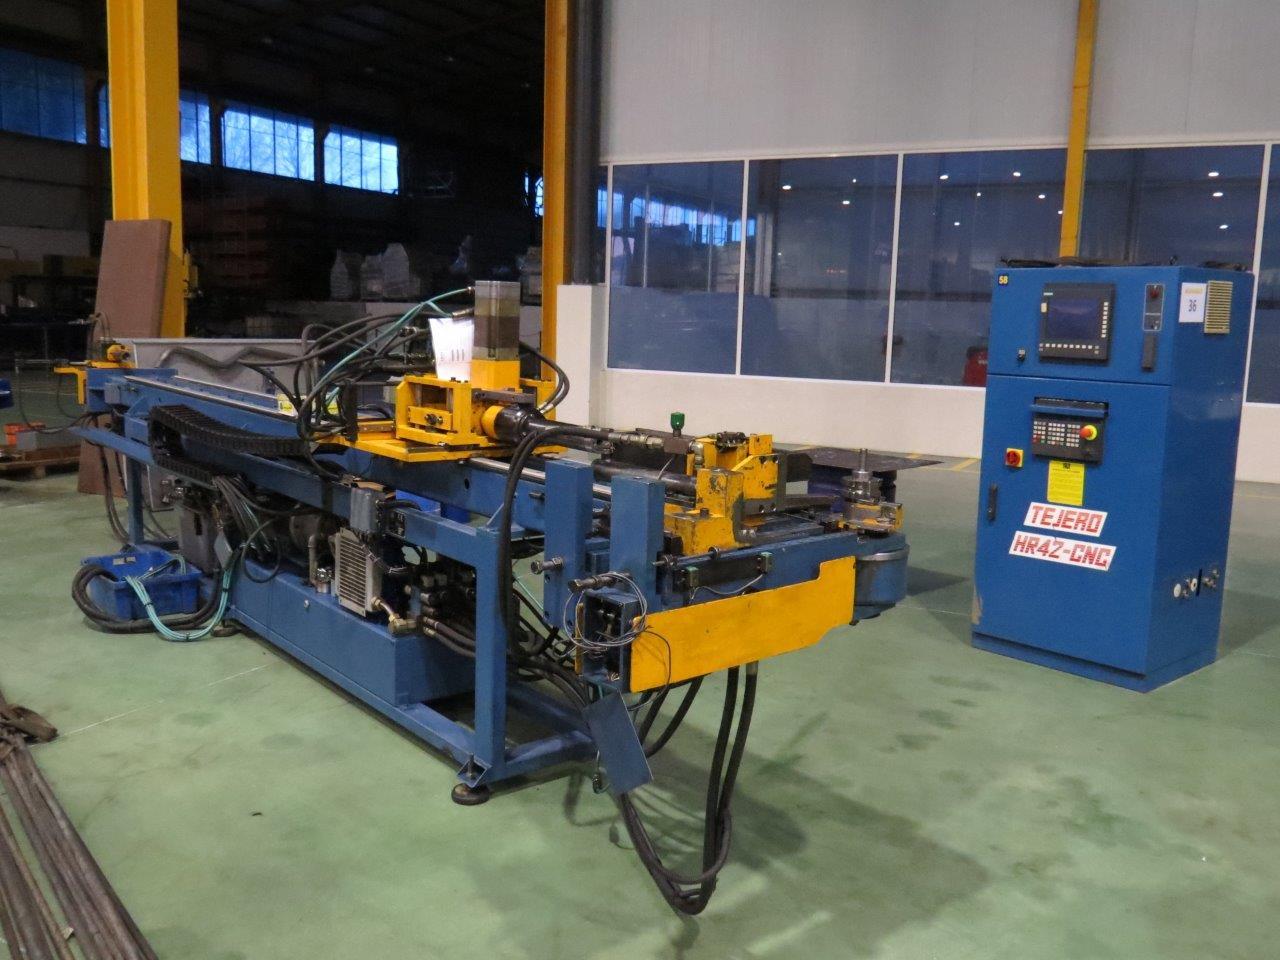 Curvadora de tubos tejero modelo hr 42 cnc v maquinas de for Curvadora de tubos segunda mano